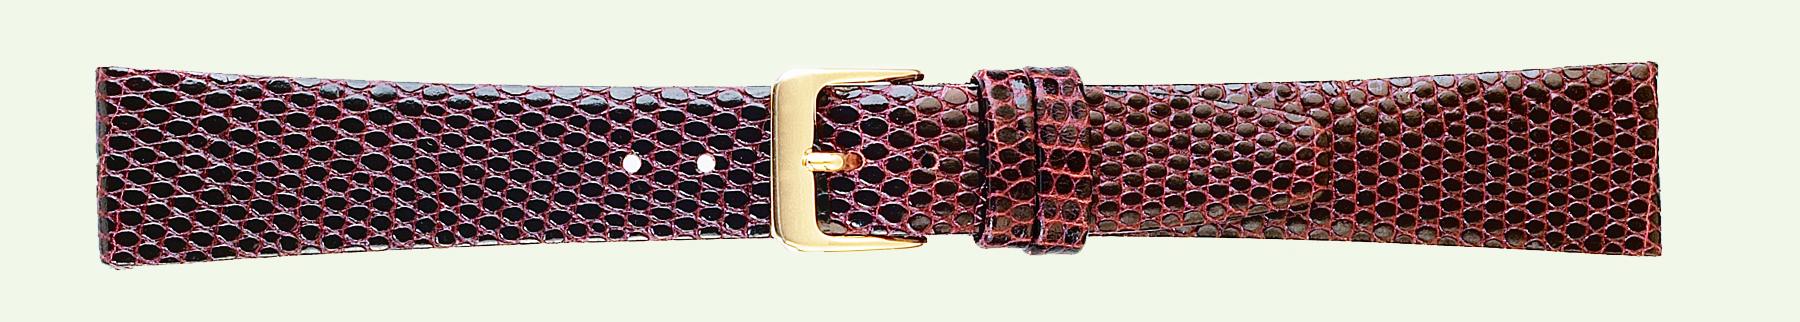 14MM Lizard Grain Brown Leather Strap-0